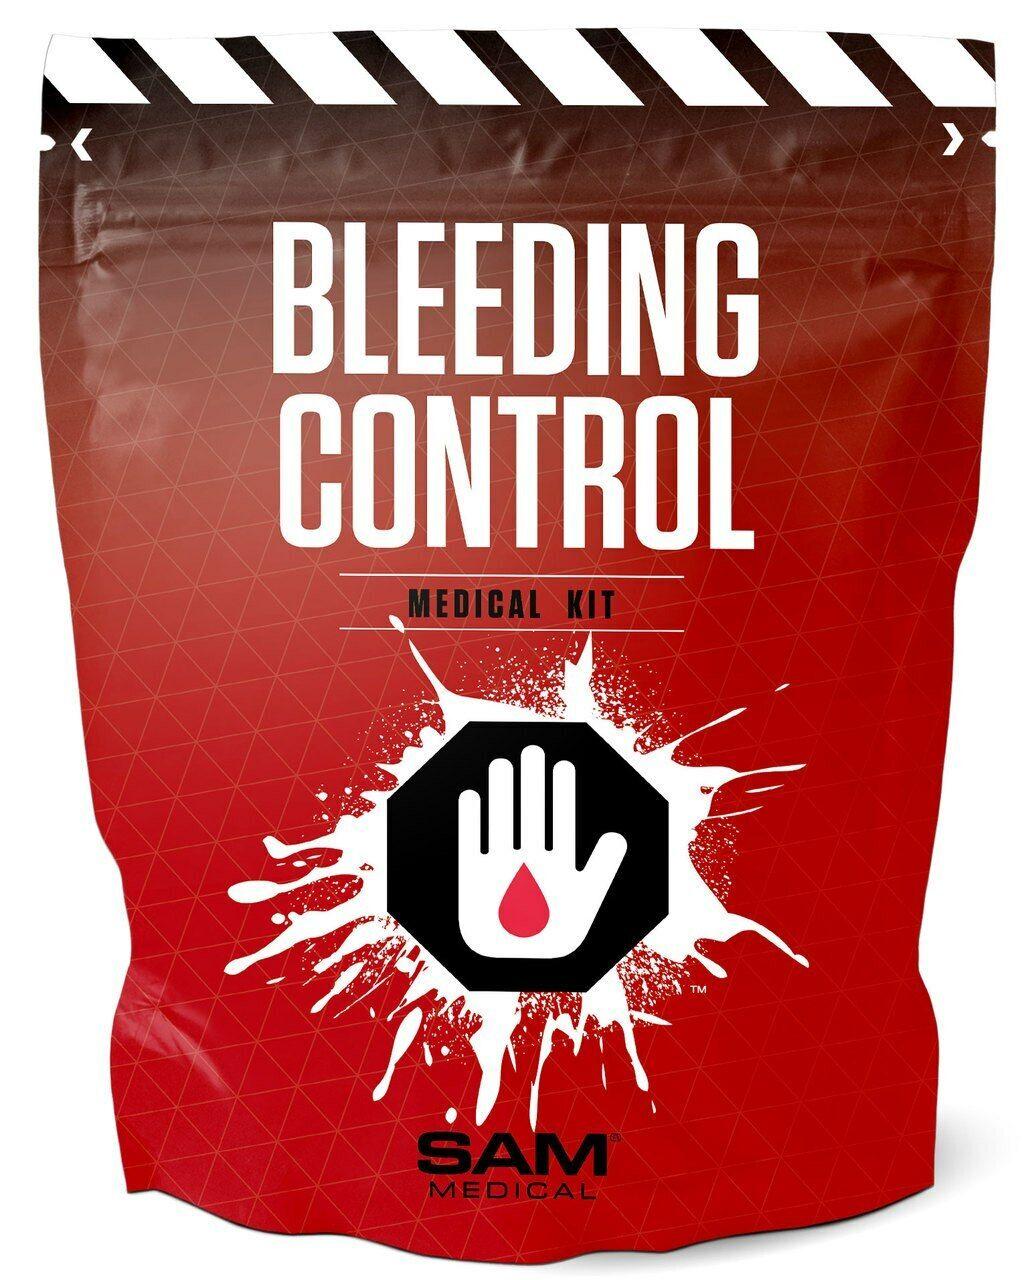 Sam Medical  Bleeding Control Kits  various sizes